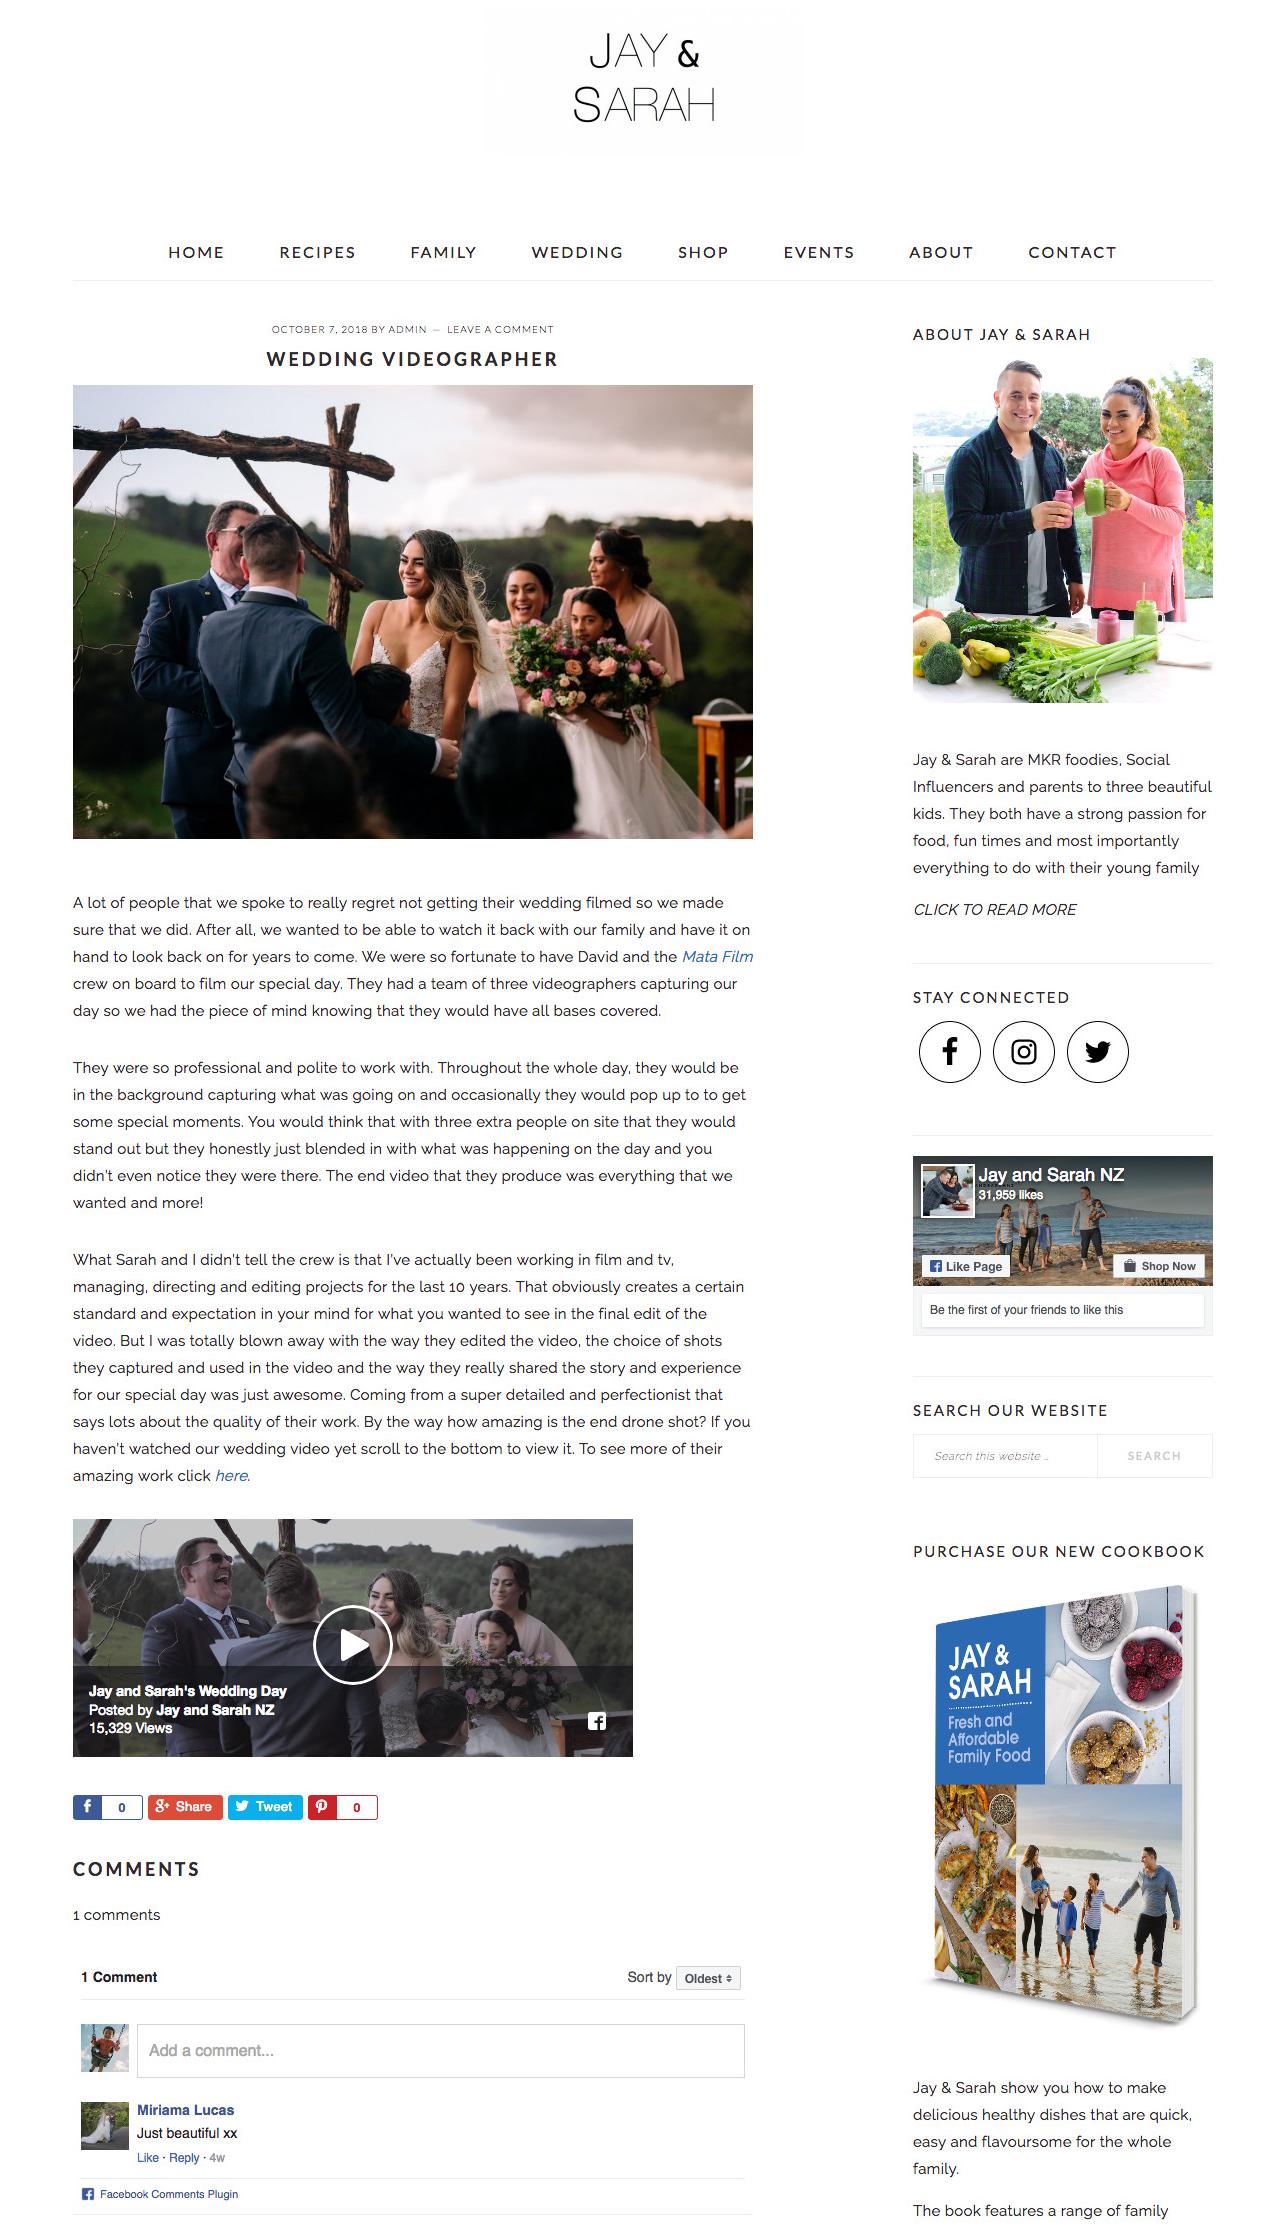 Read the full article here  http://www.jayandsarah.nz/wedding/videographer-mata-films/